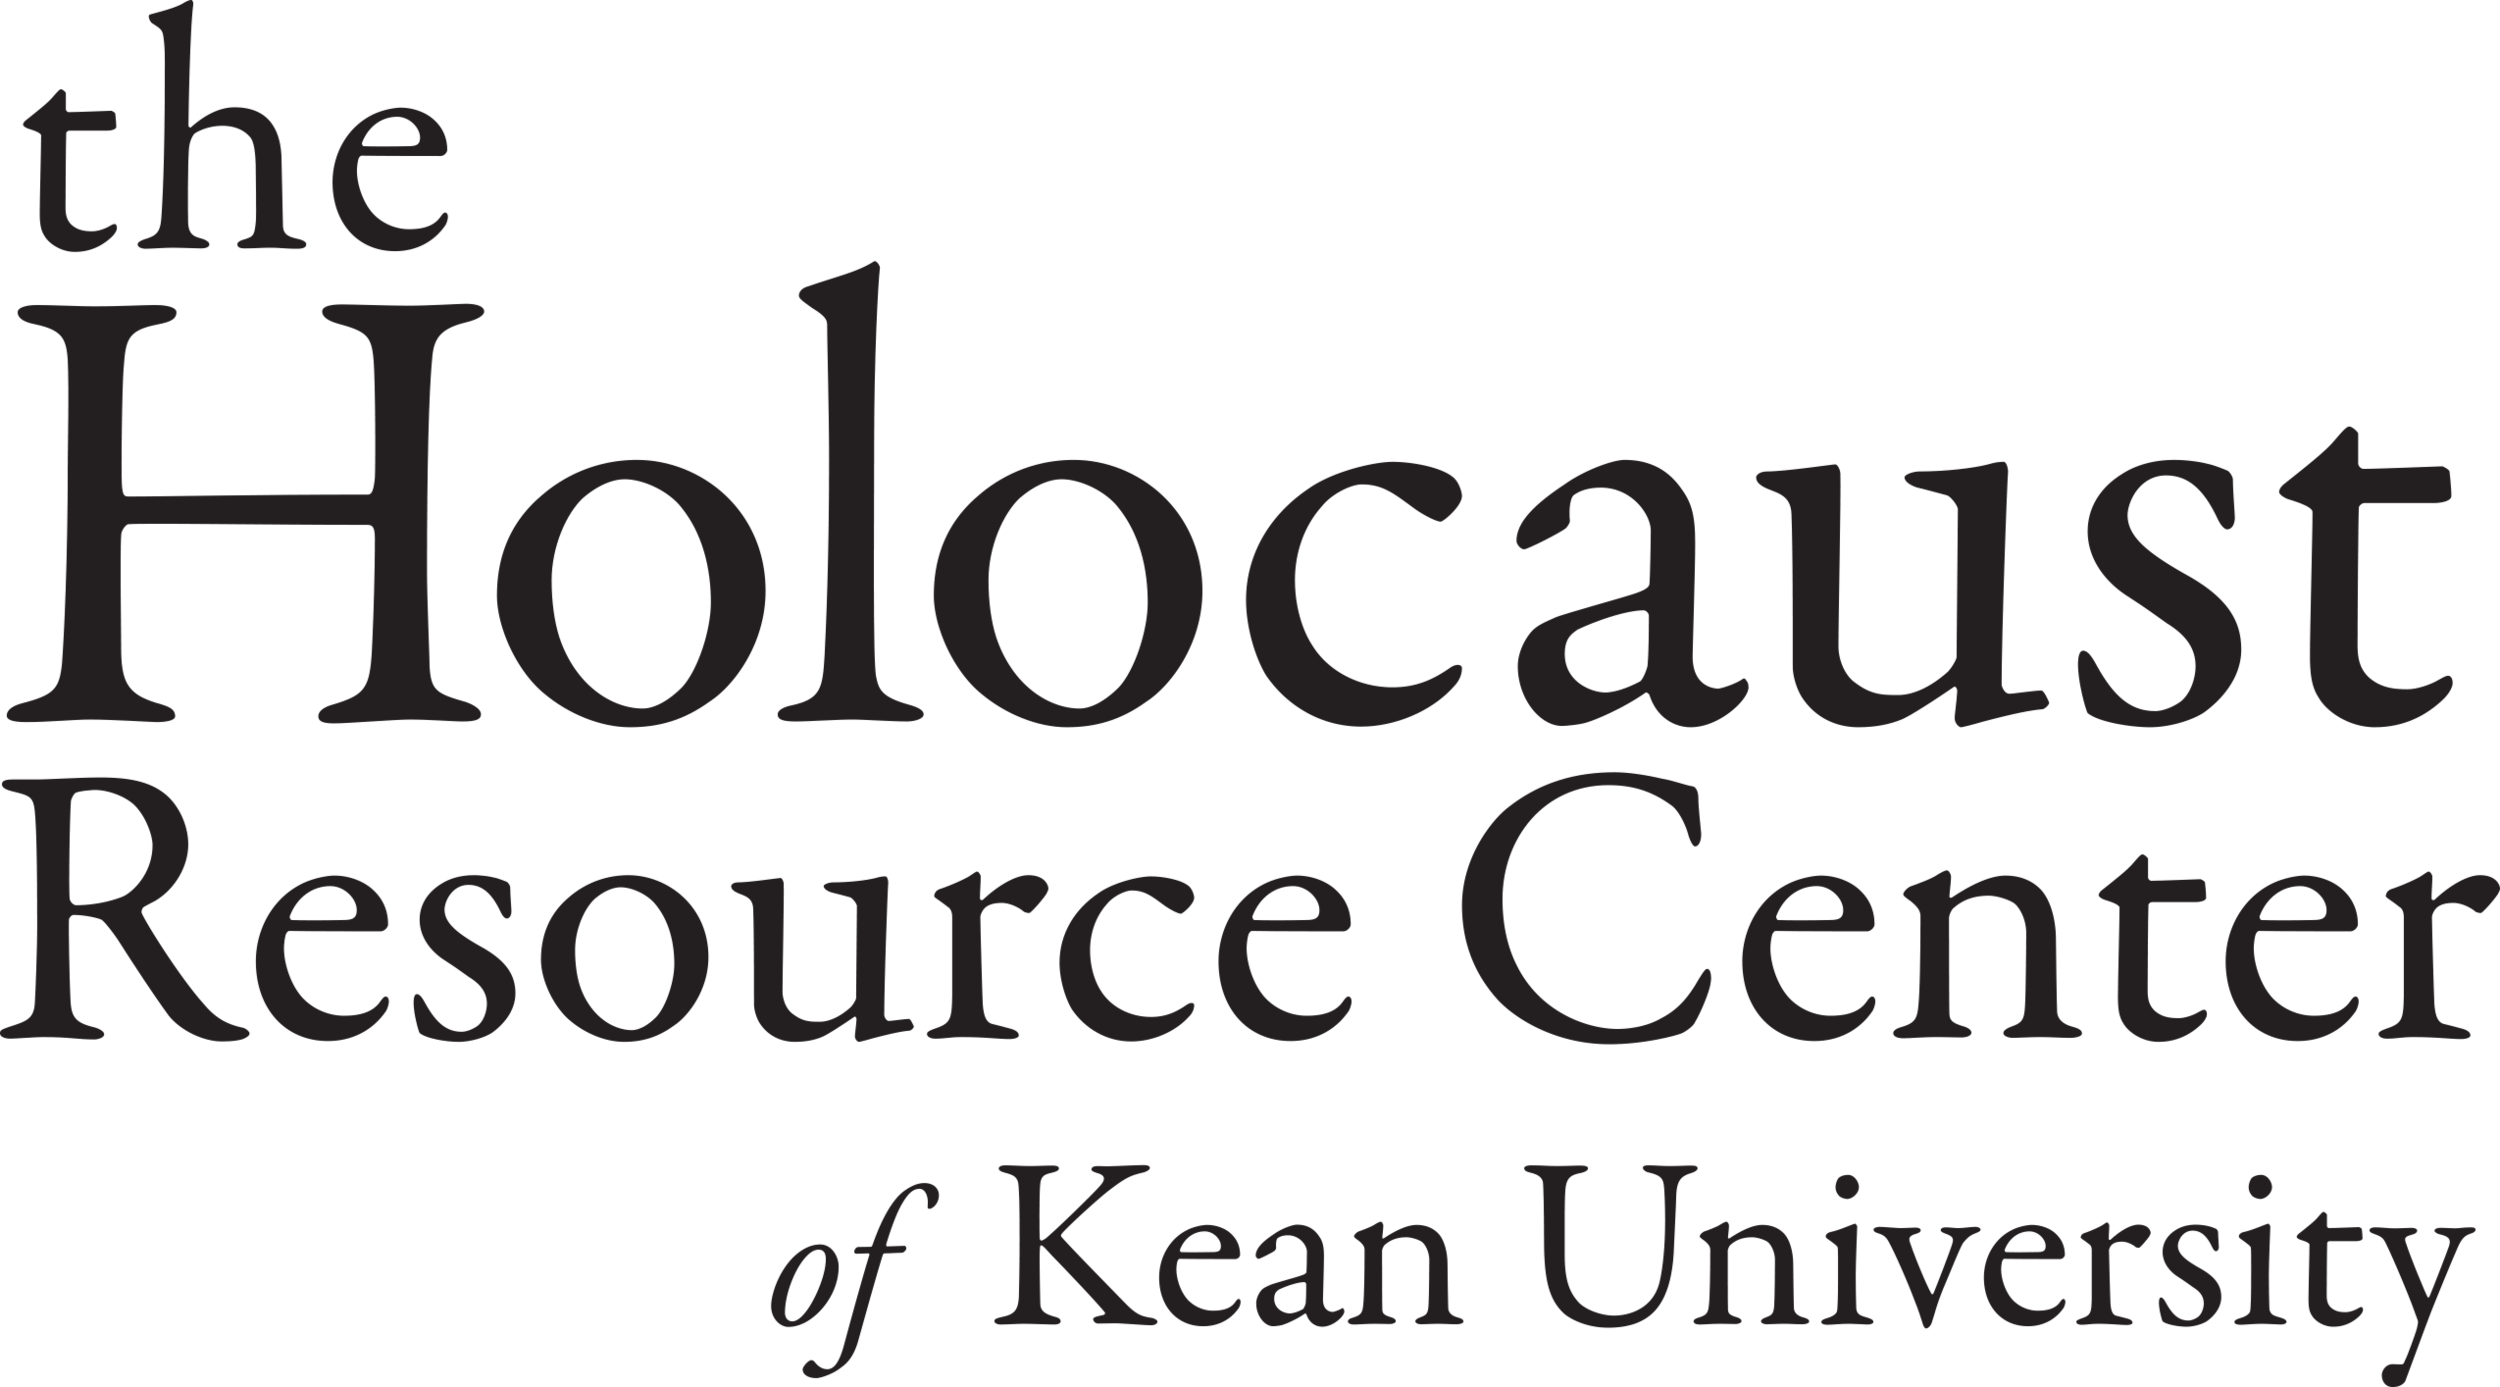 Holocaust Resource Center of Kean University Logo.png